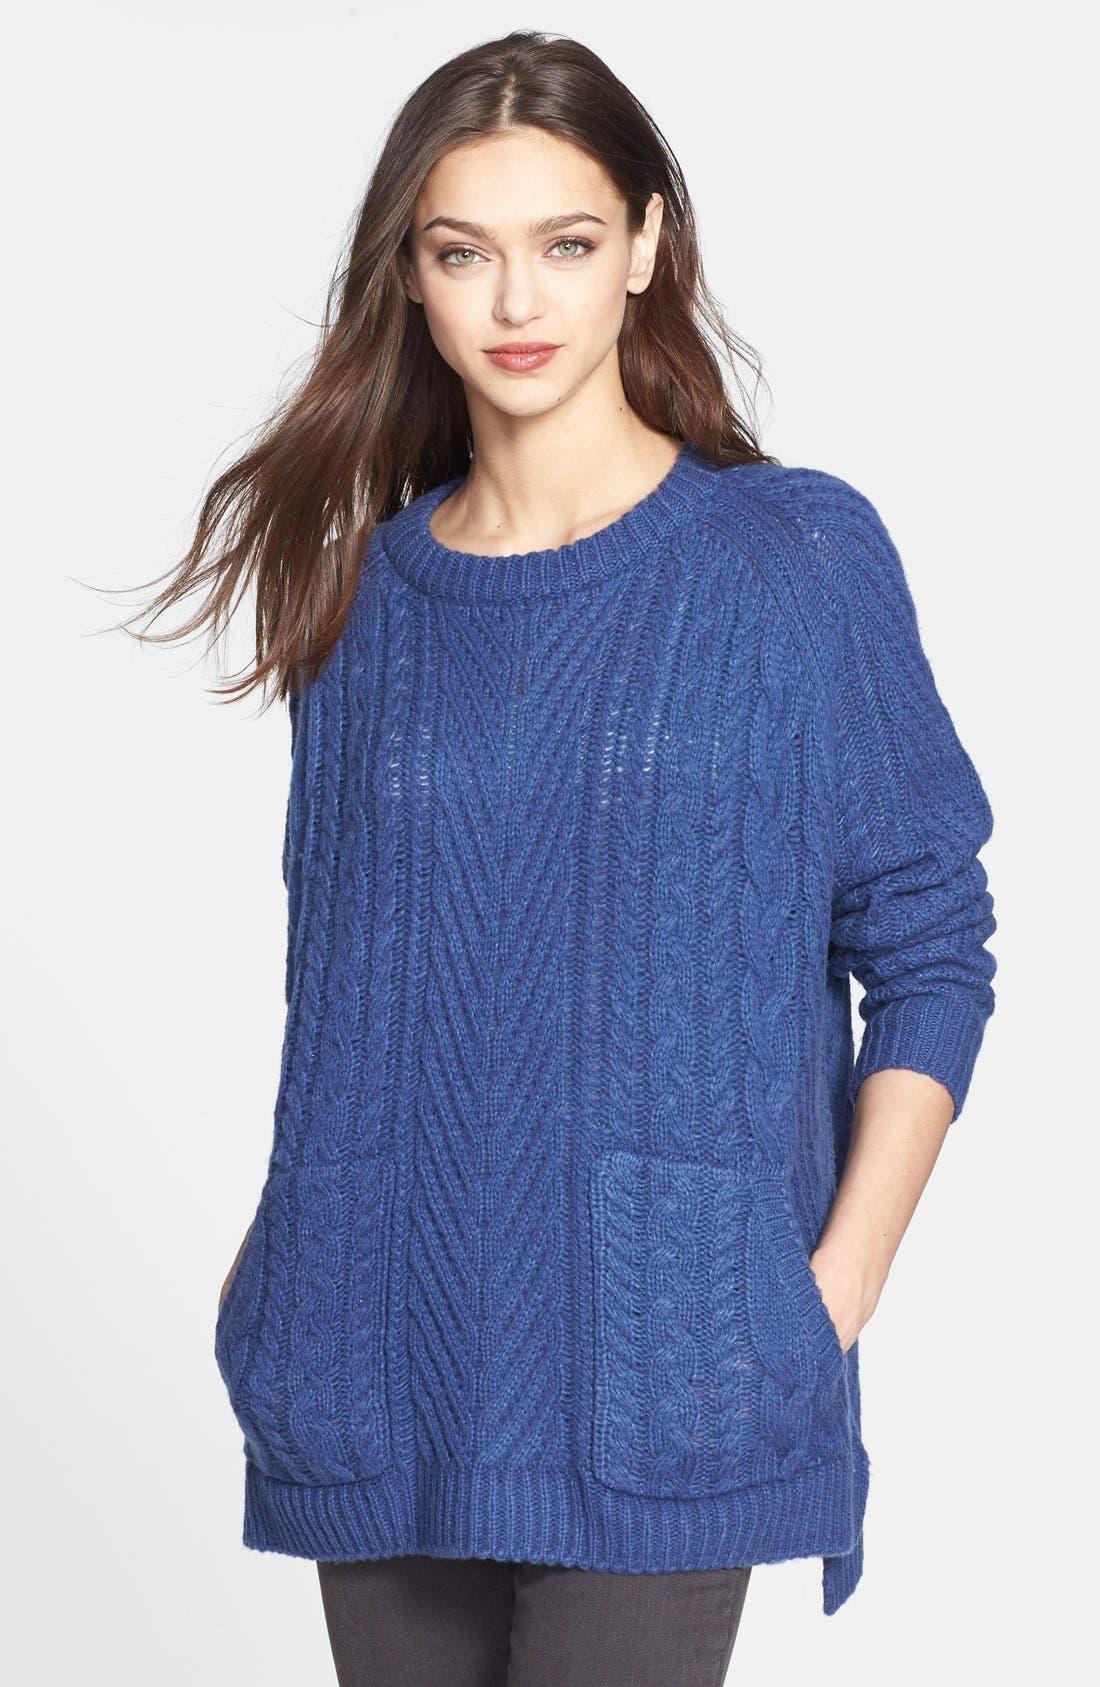 'James' Sweater,                             Main thumbnail 1, color,                             020